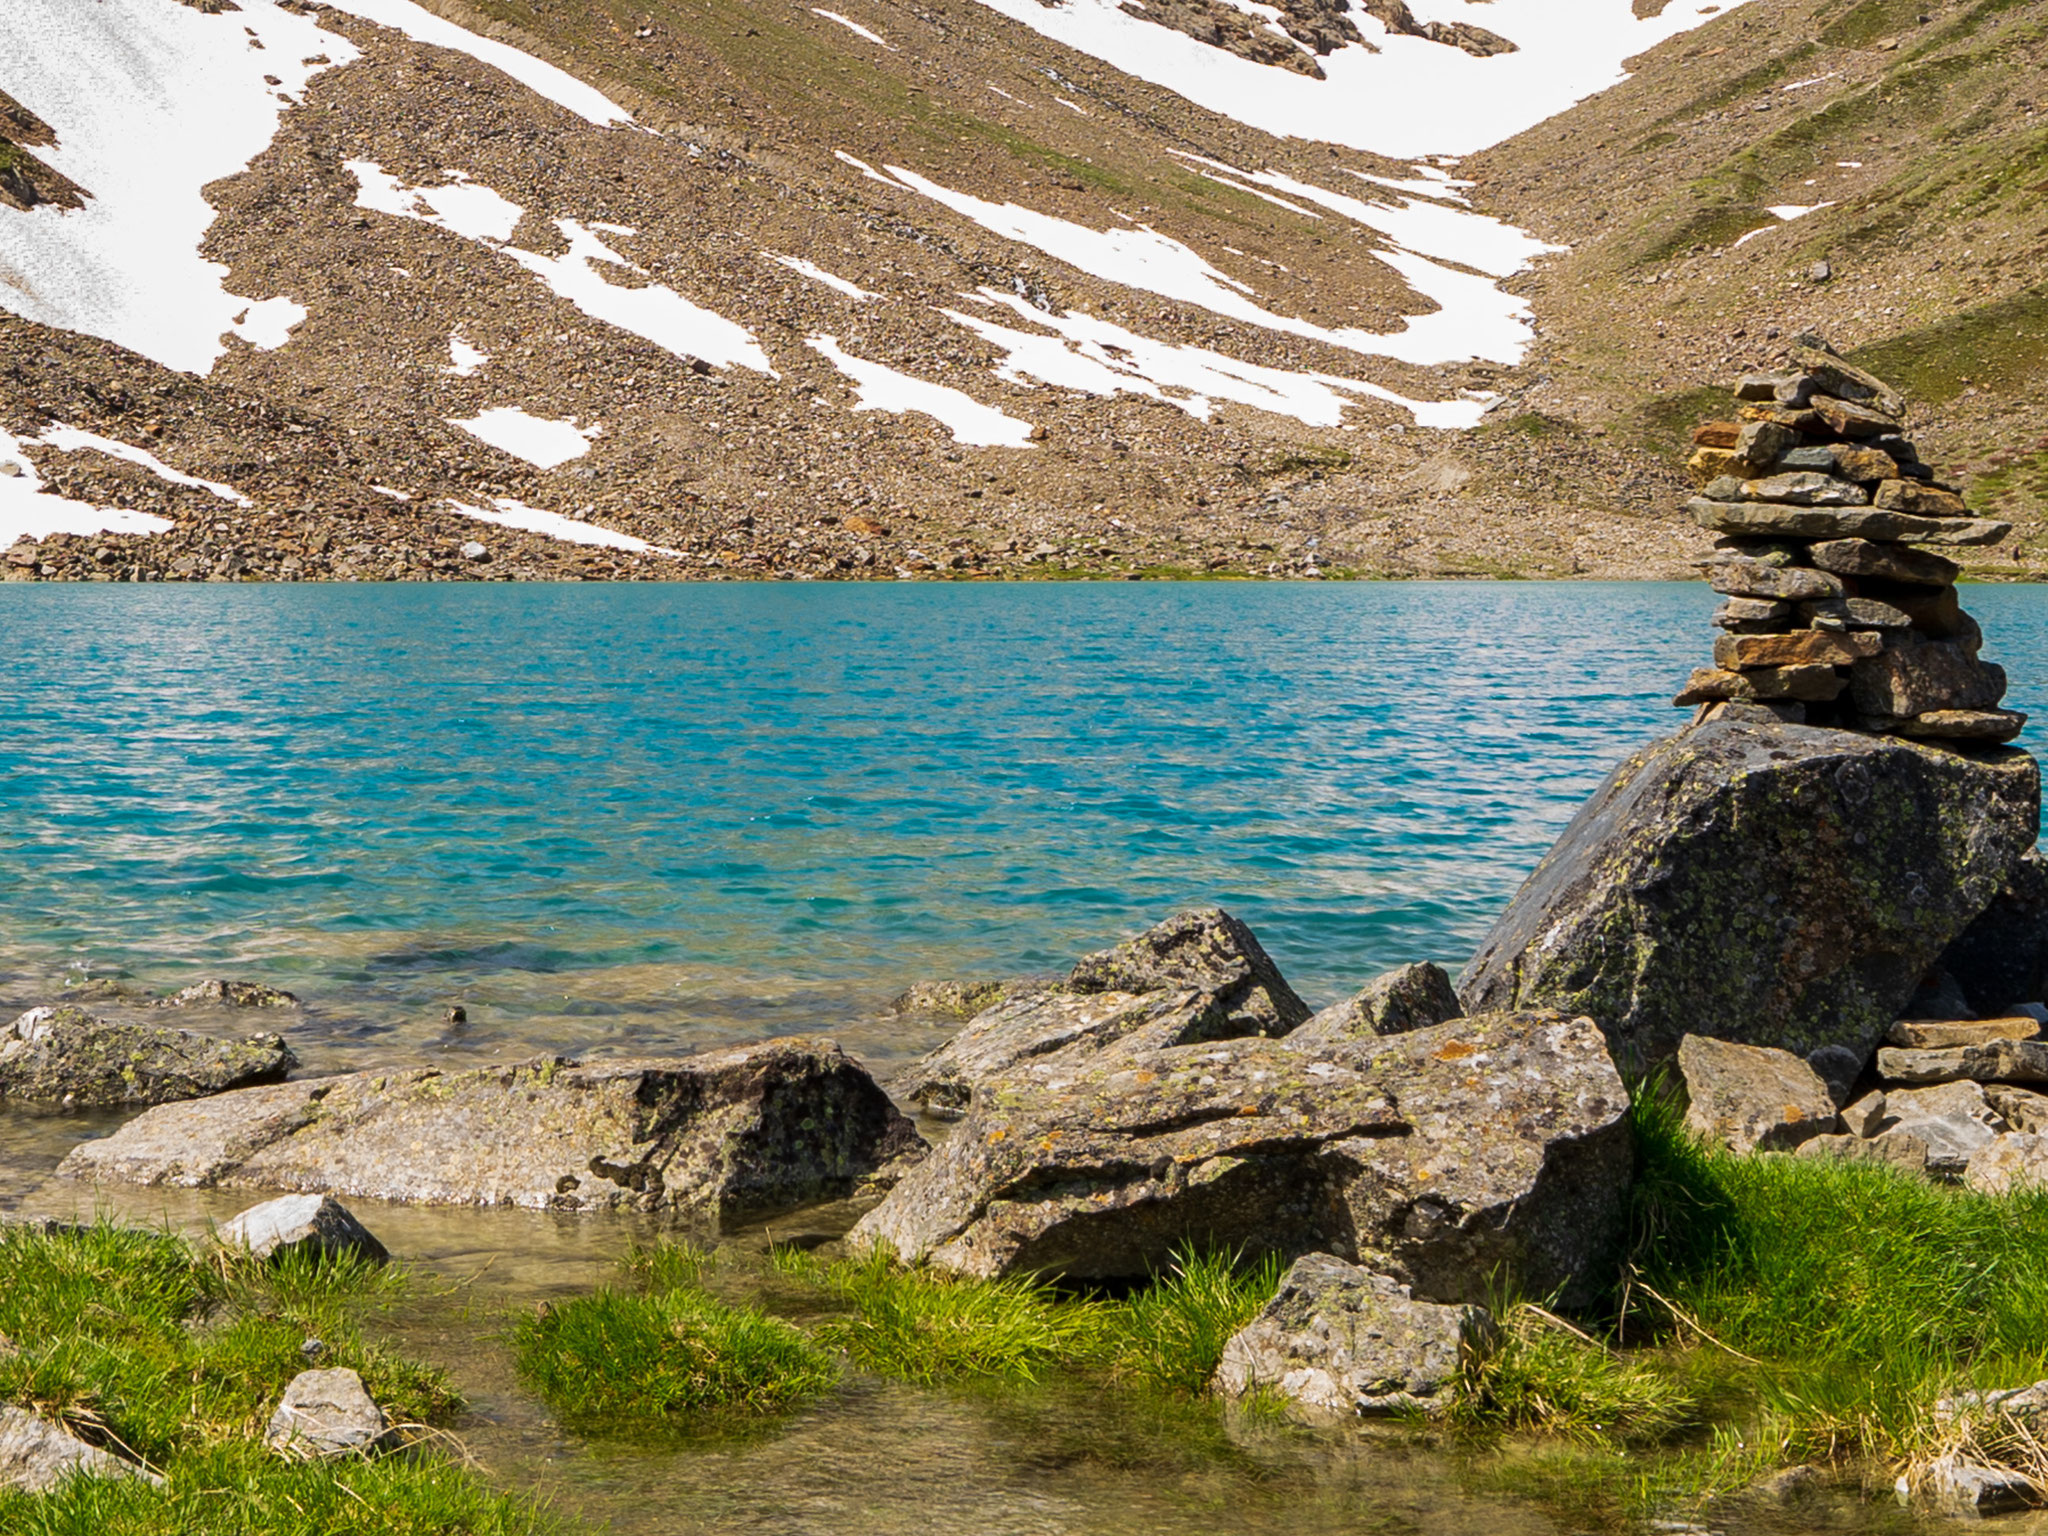 Achtsamkeitswandern, meditatives Wandern, Stubaital